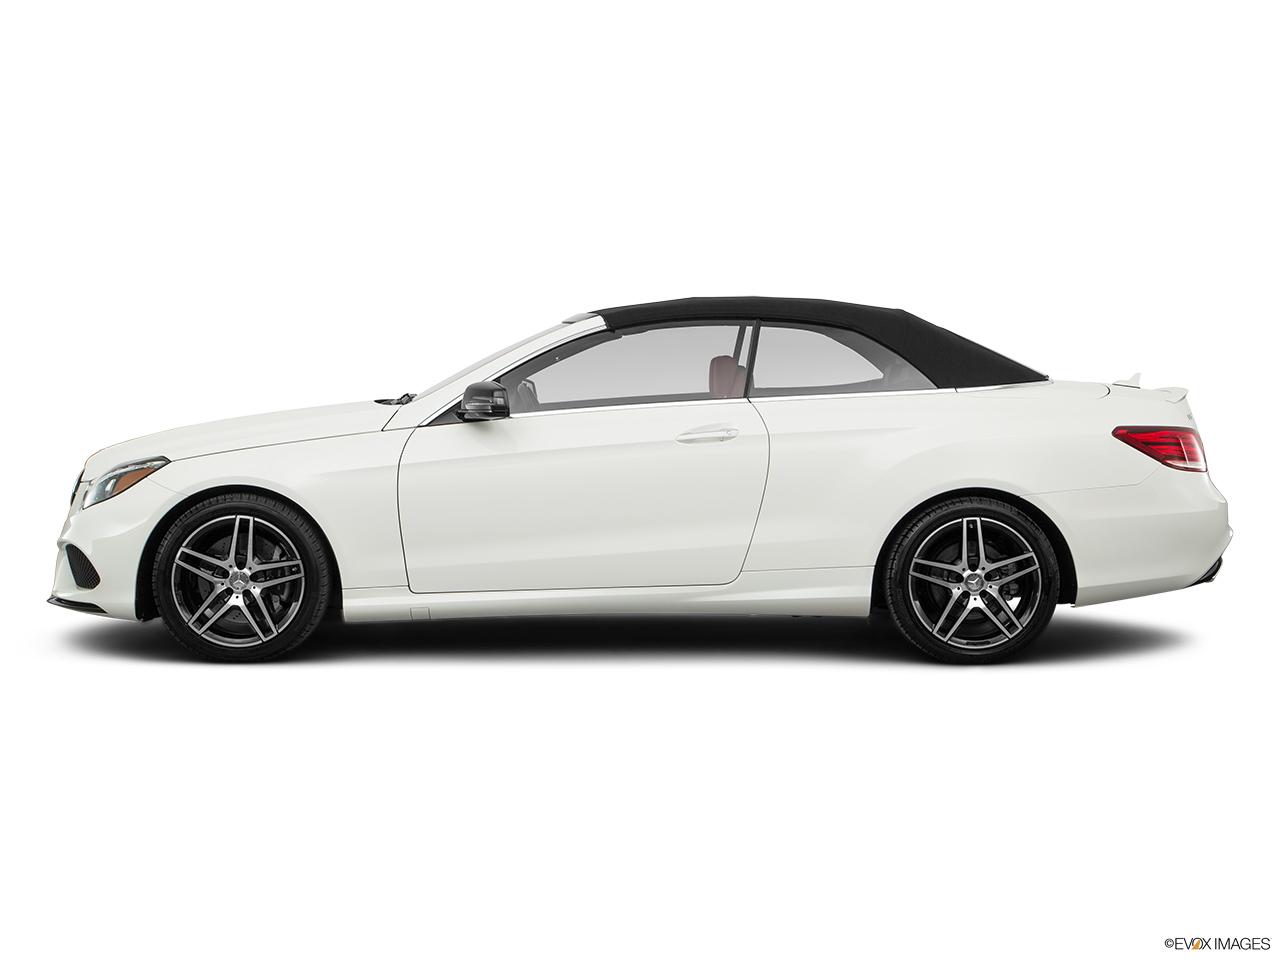 Car Features List For Mercedes Benz E Class Cabriolet 2016